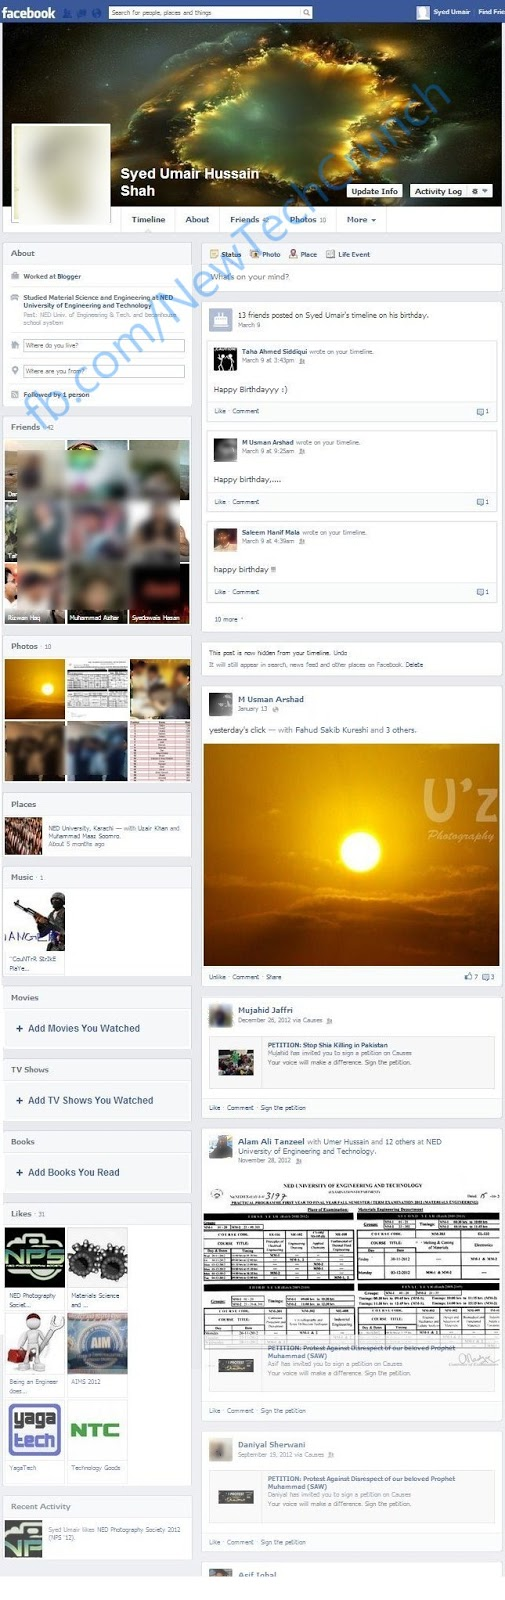 New Facebook Timeline Profile design